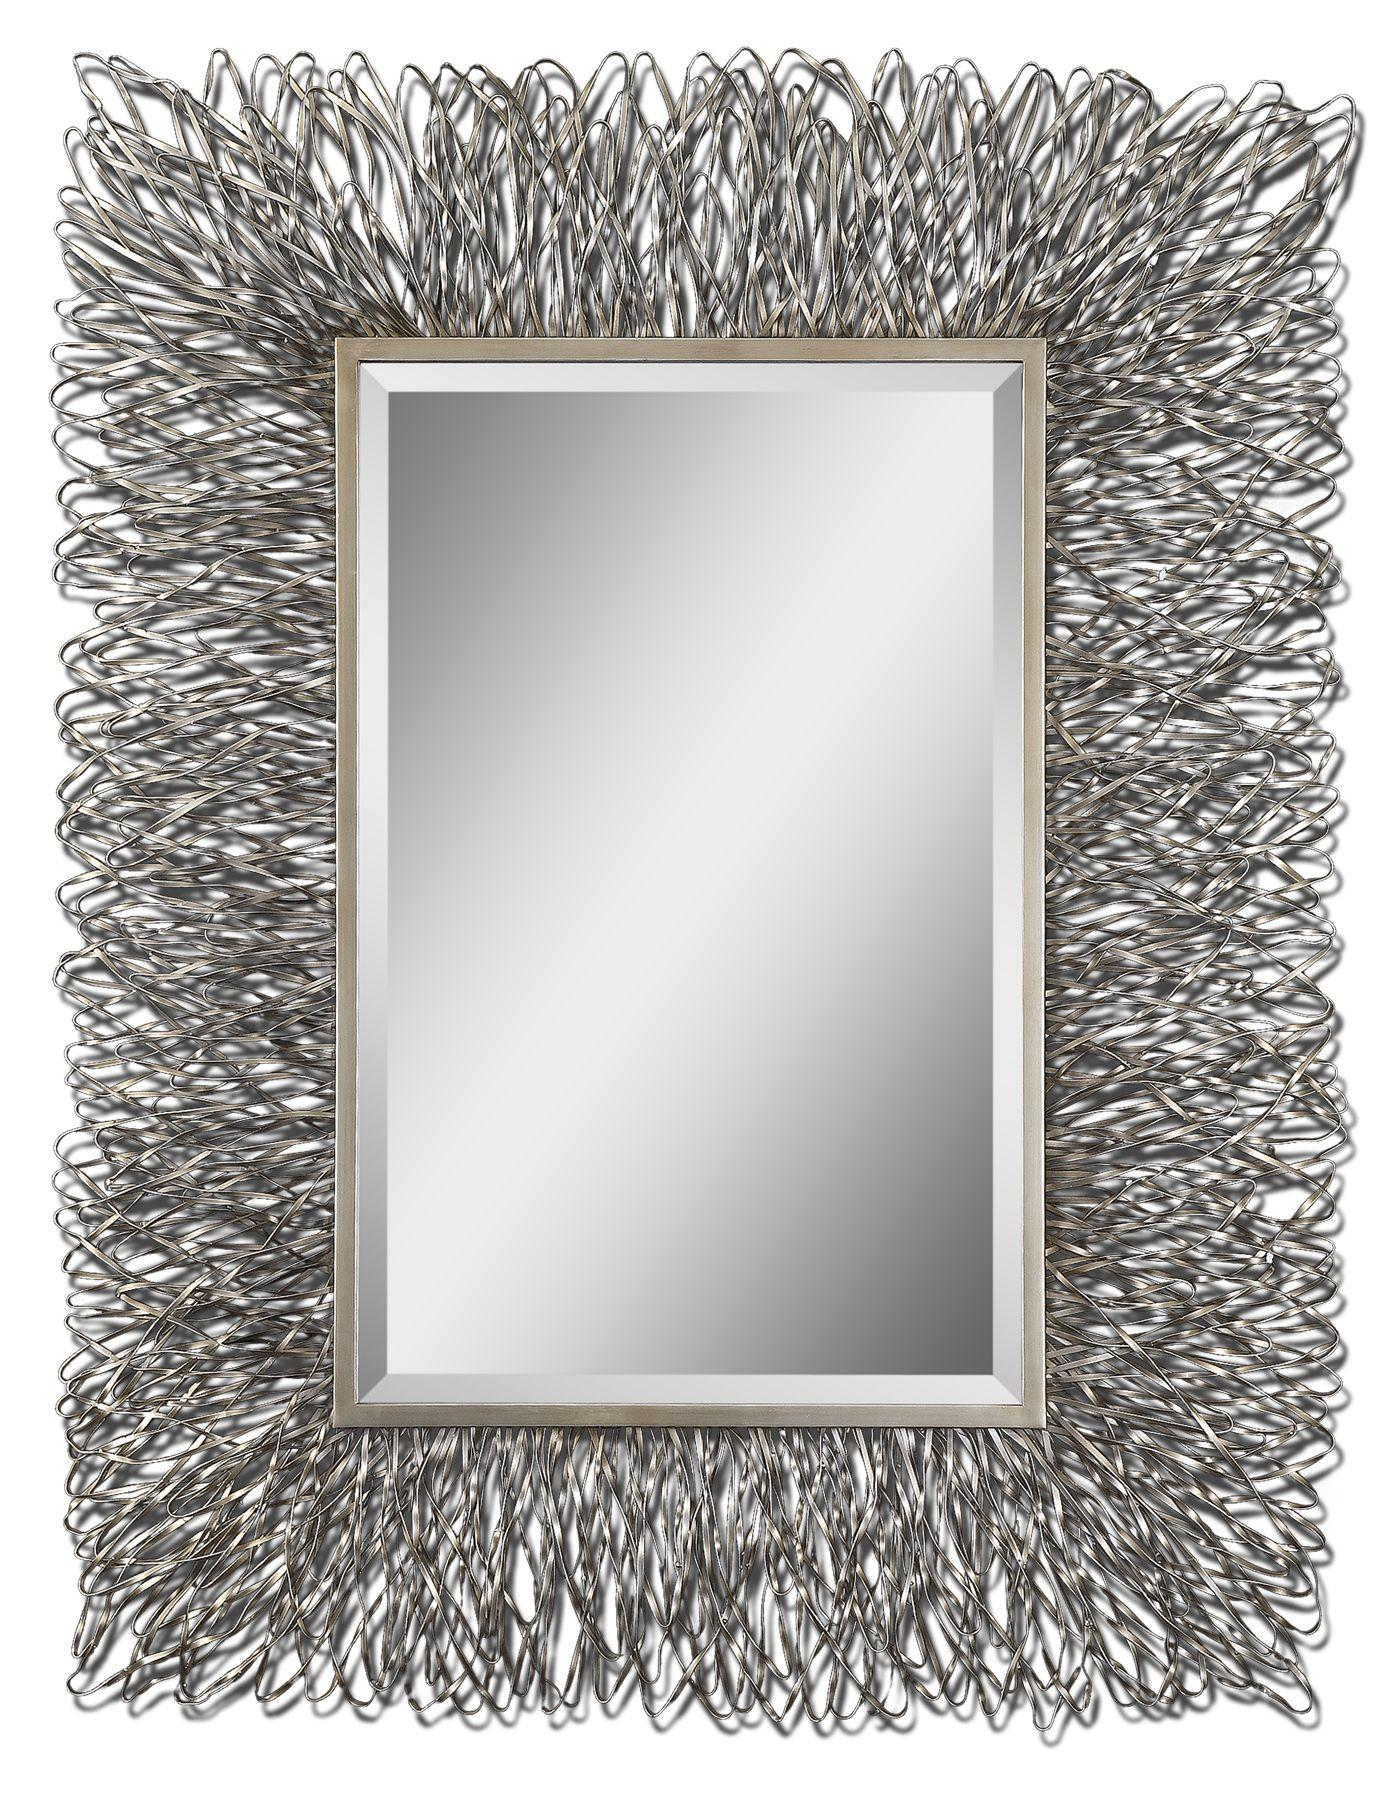 Uttermost Mirrors Corbis Mirror - Item Number: 07627